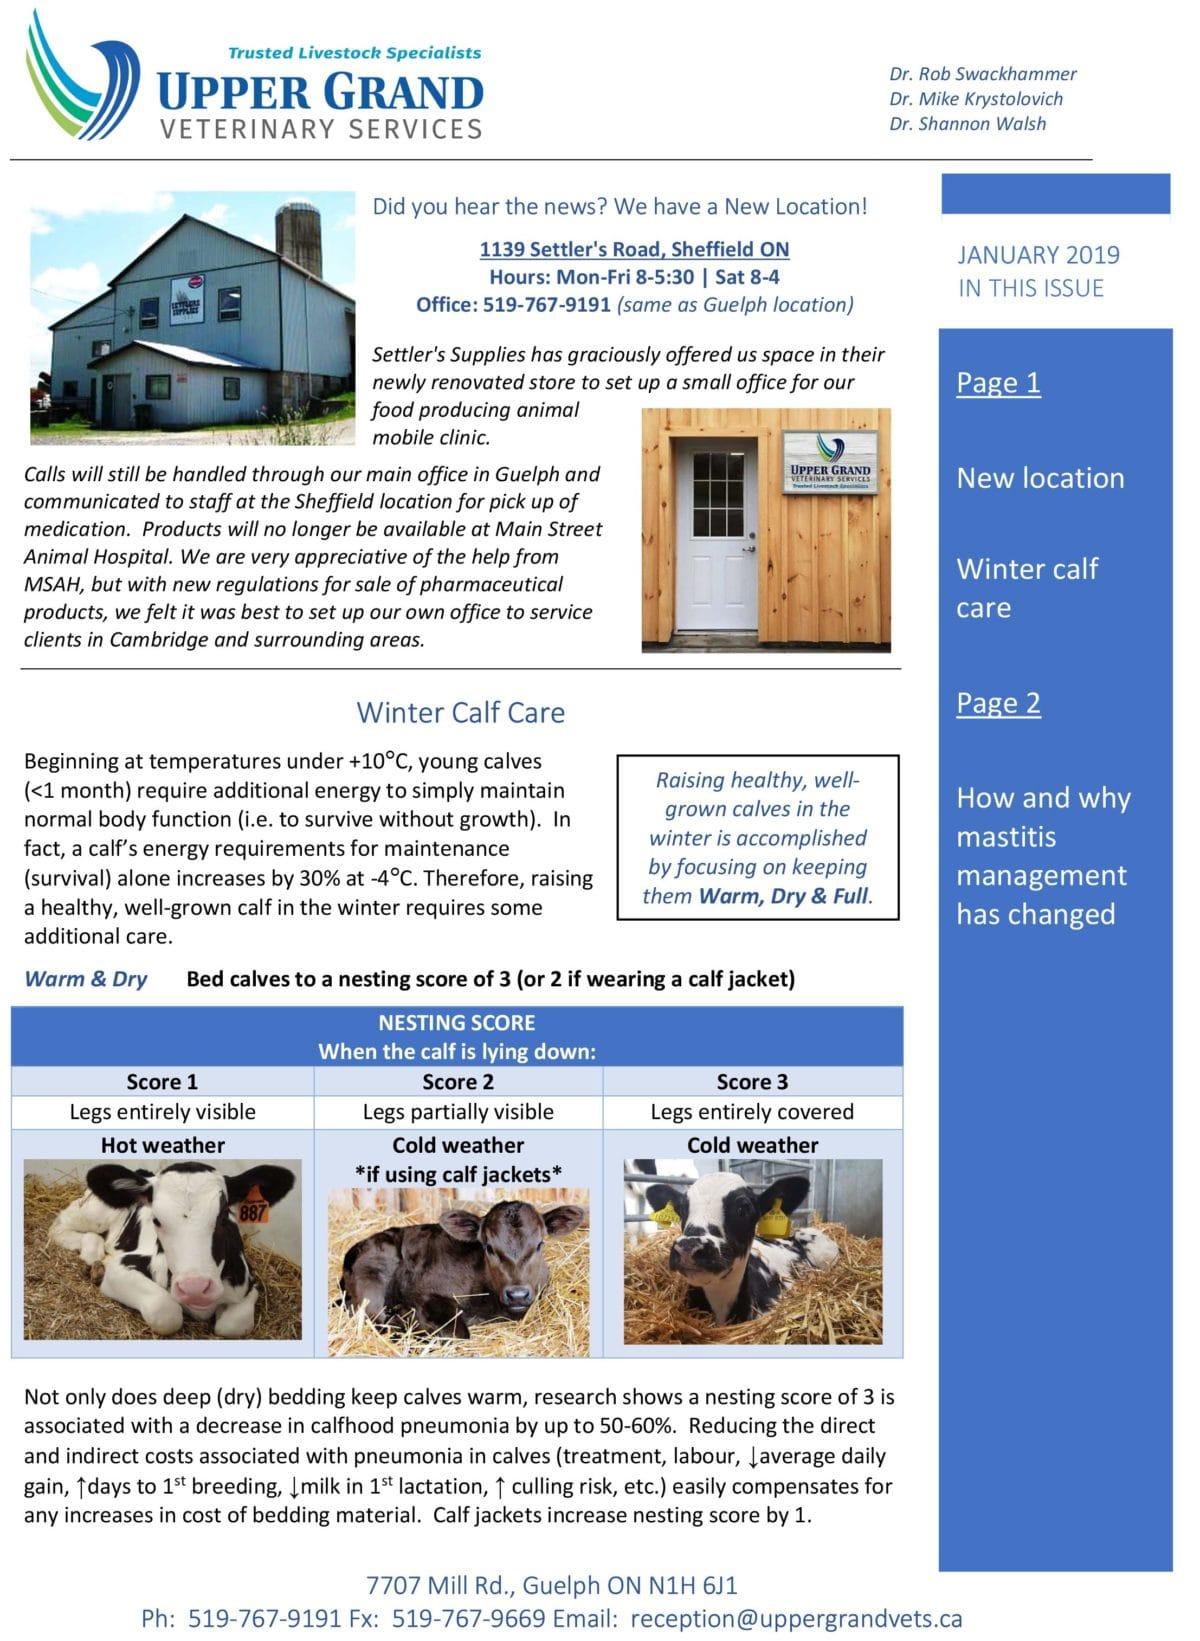 UGVS-Newsletter_Jan-2019-1-copy-1200x1641.jpg